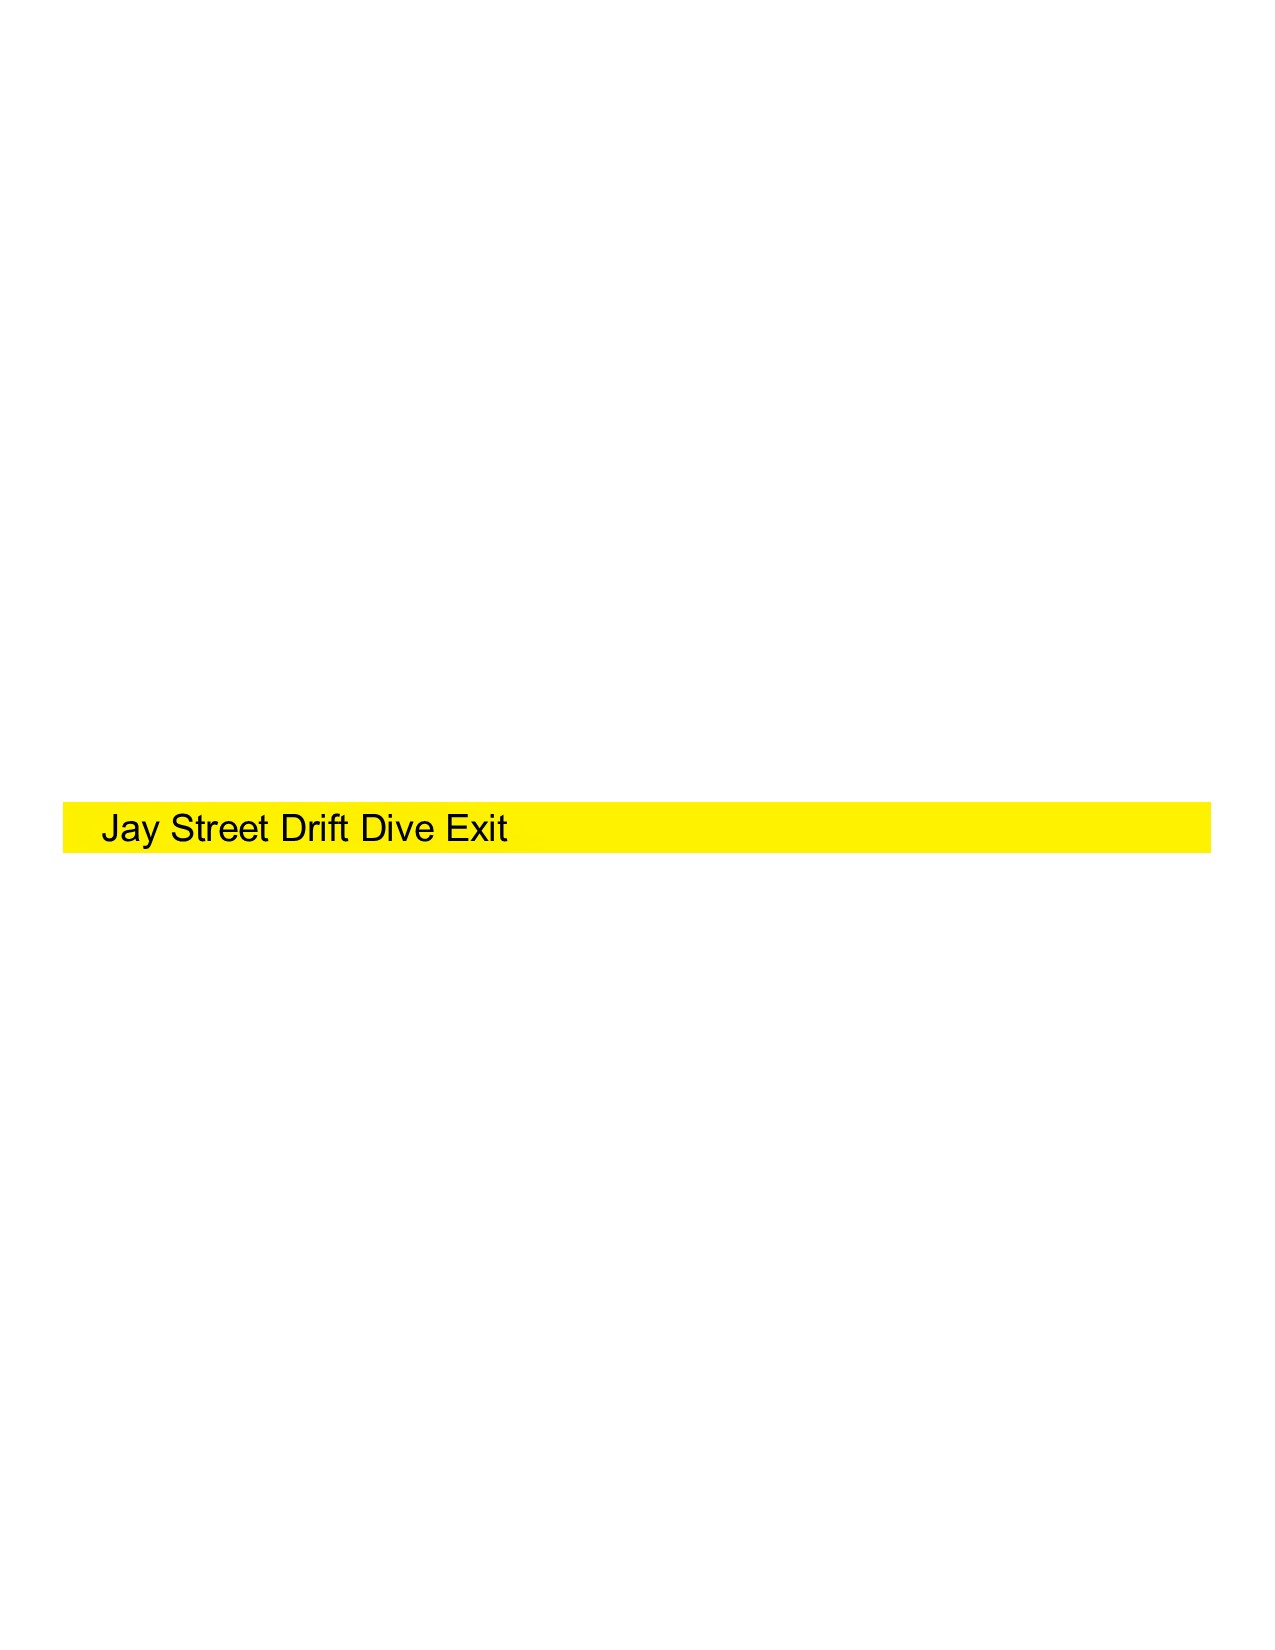 Jay_Street_Drift_Exit.jpg